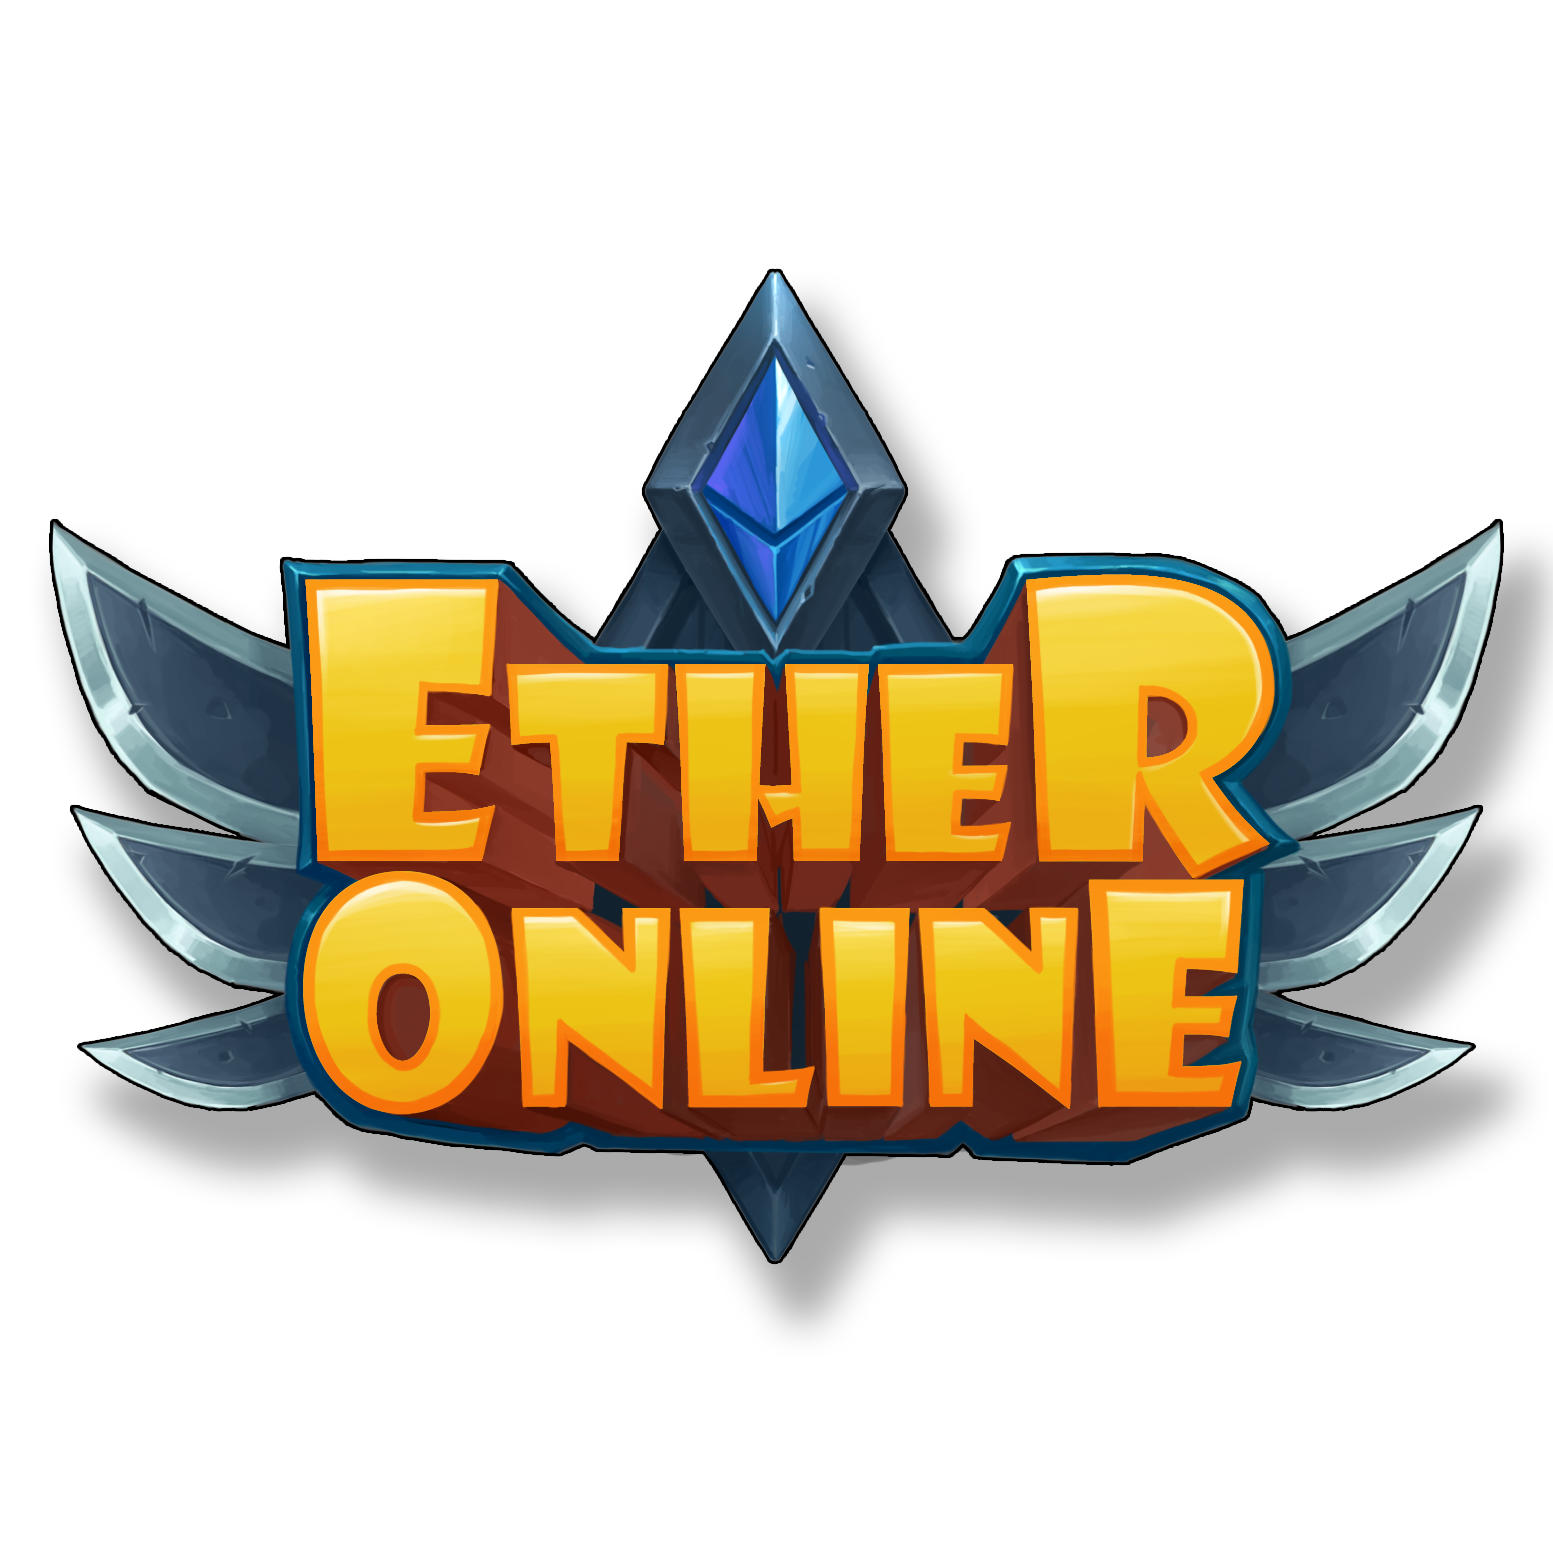 EtherOnline logo